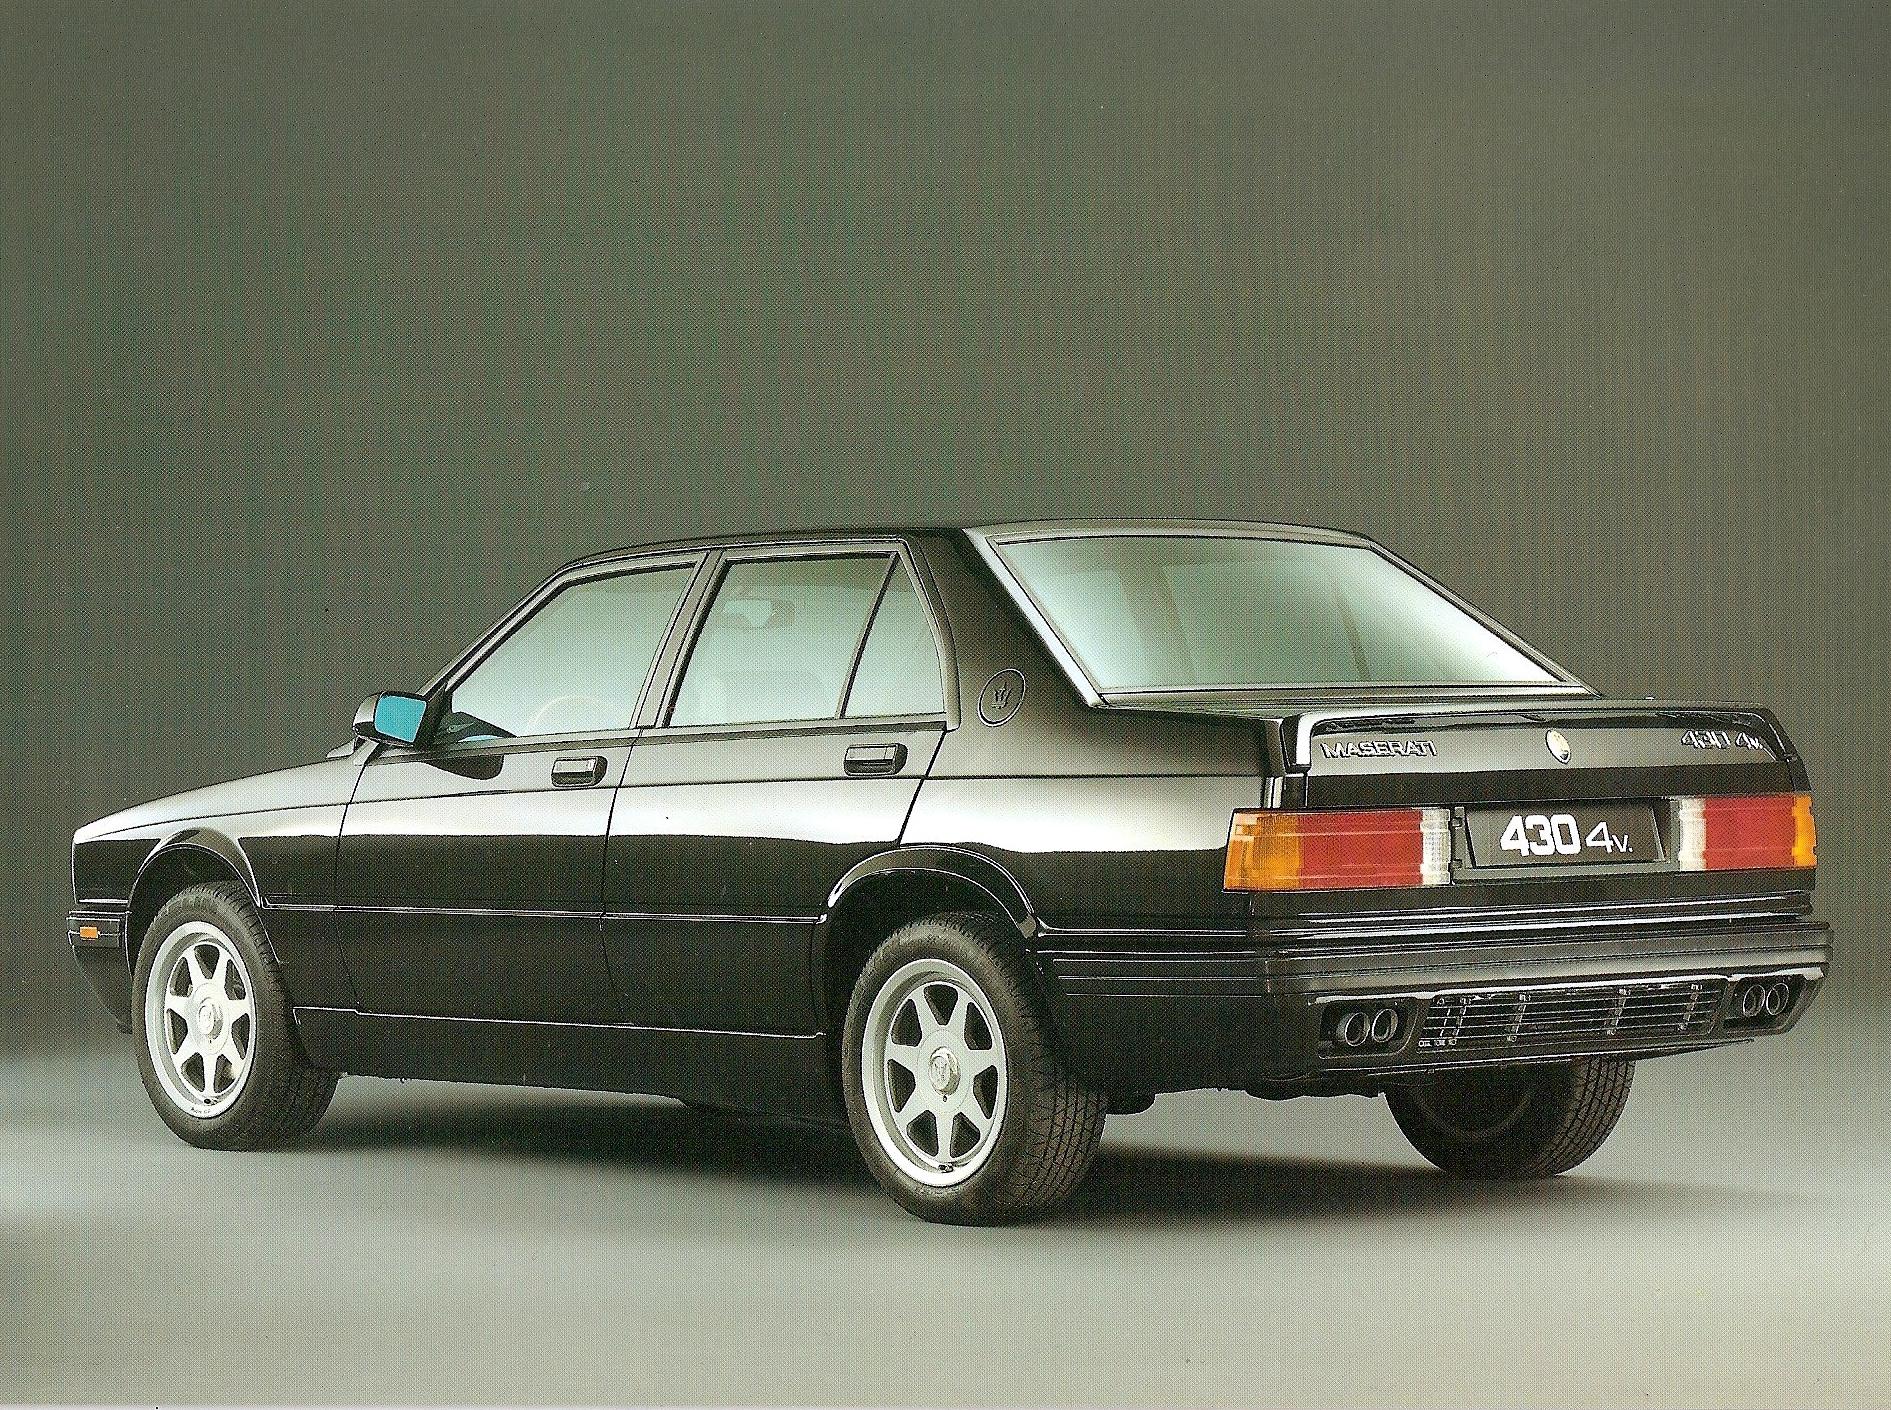 Maserati 430 4v (1991)